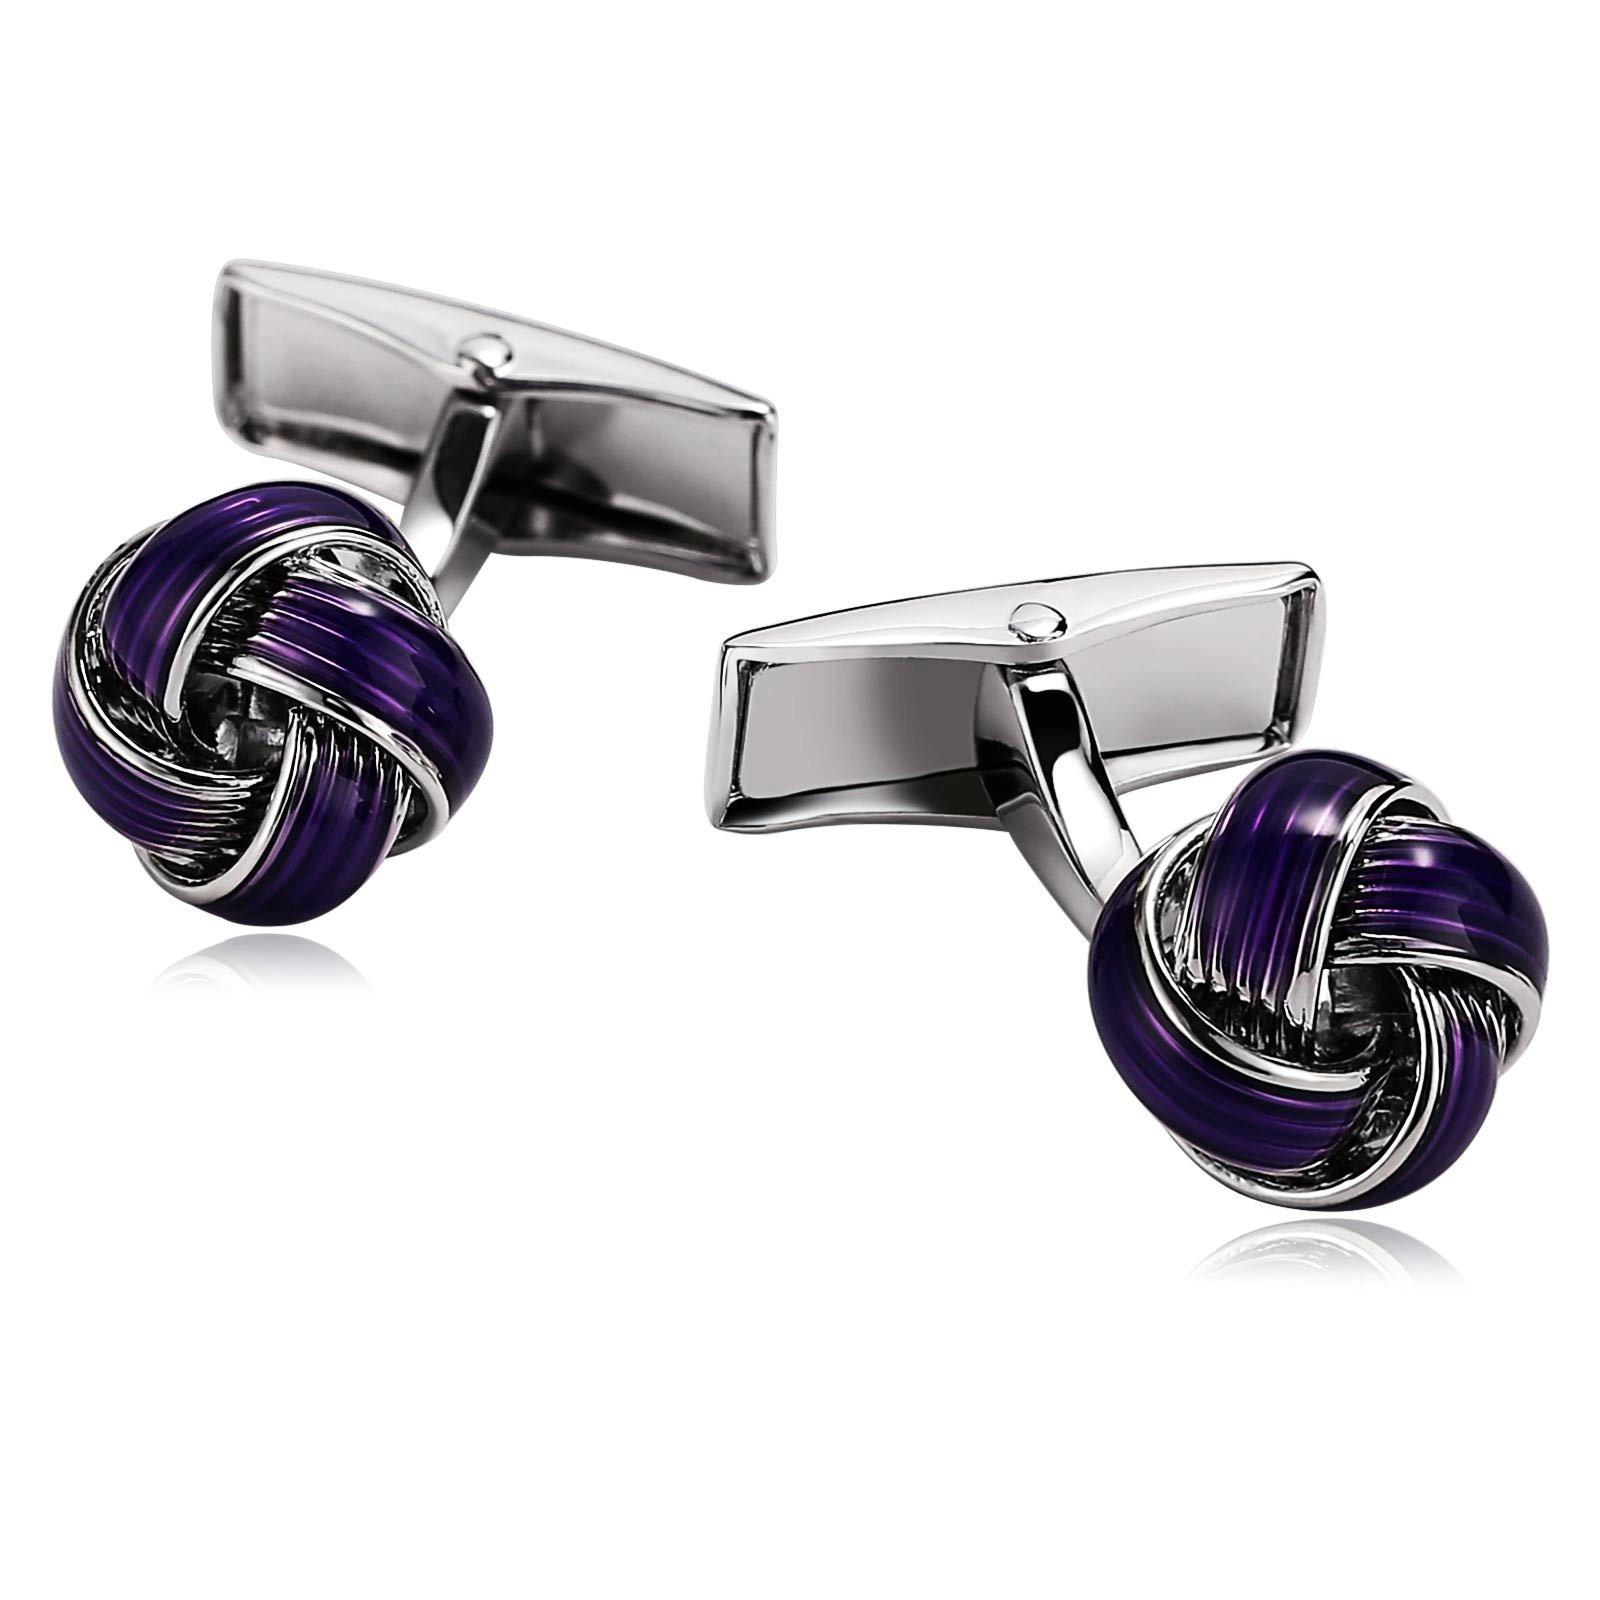 Aokarry Cufflinks-Men's Stainless Steel Love Knot Cuff Links Purple by Aokarry (Image #1)